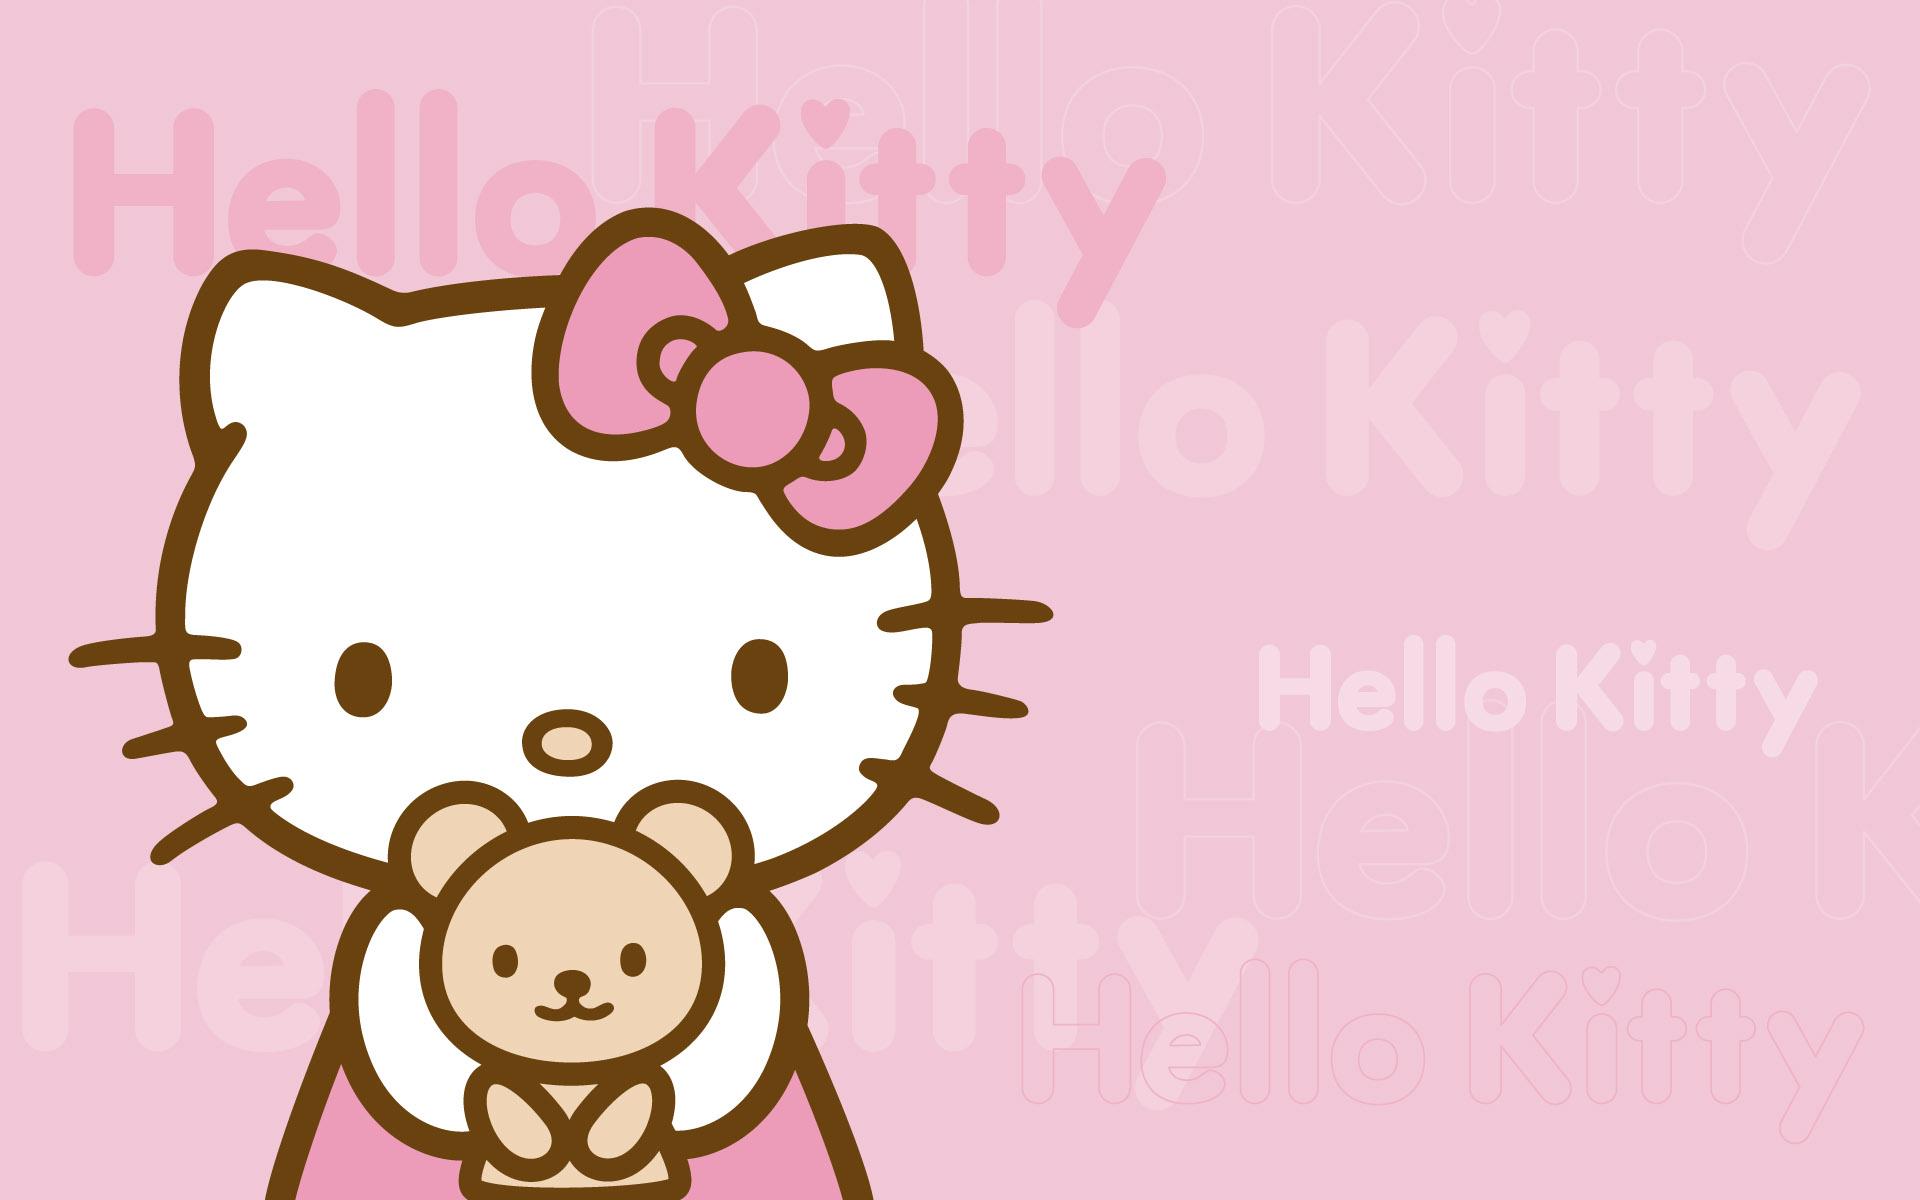 Wallpaper Background Hello Kitty Wallpapersafari